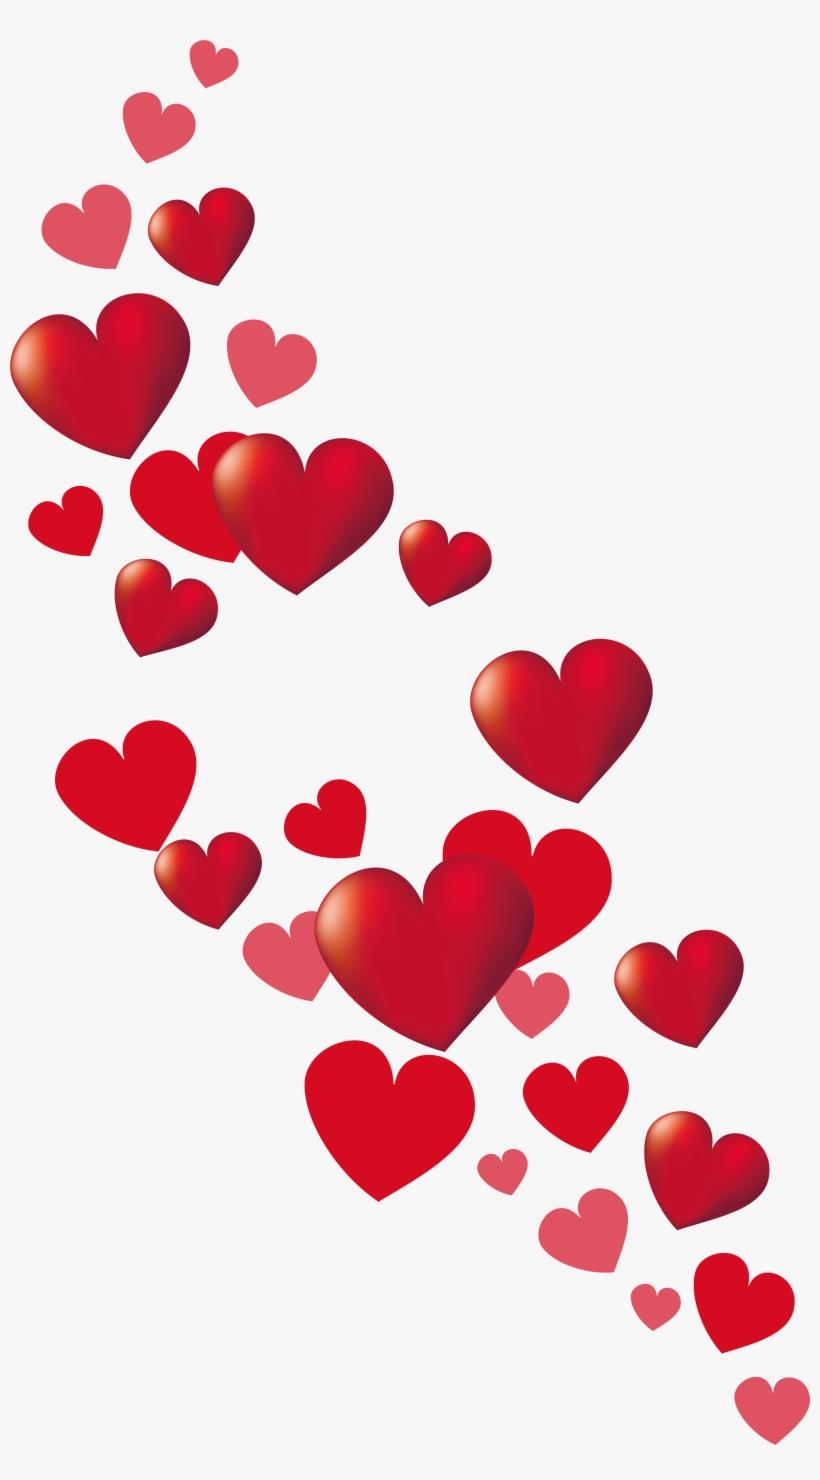 Hearts Clipart Transparent Background.